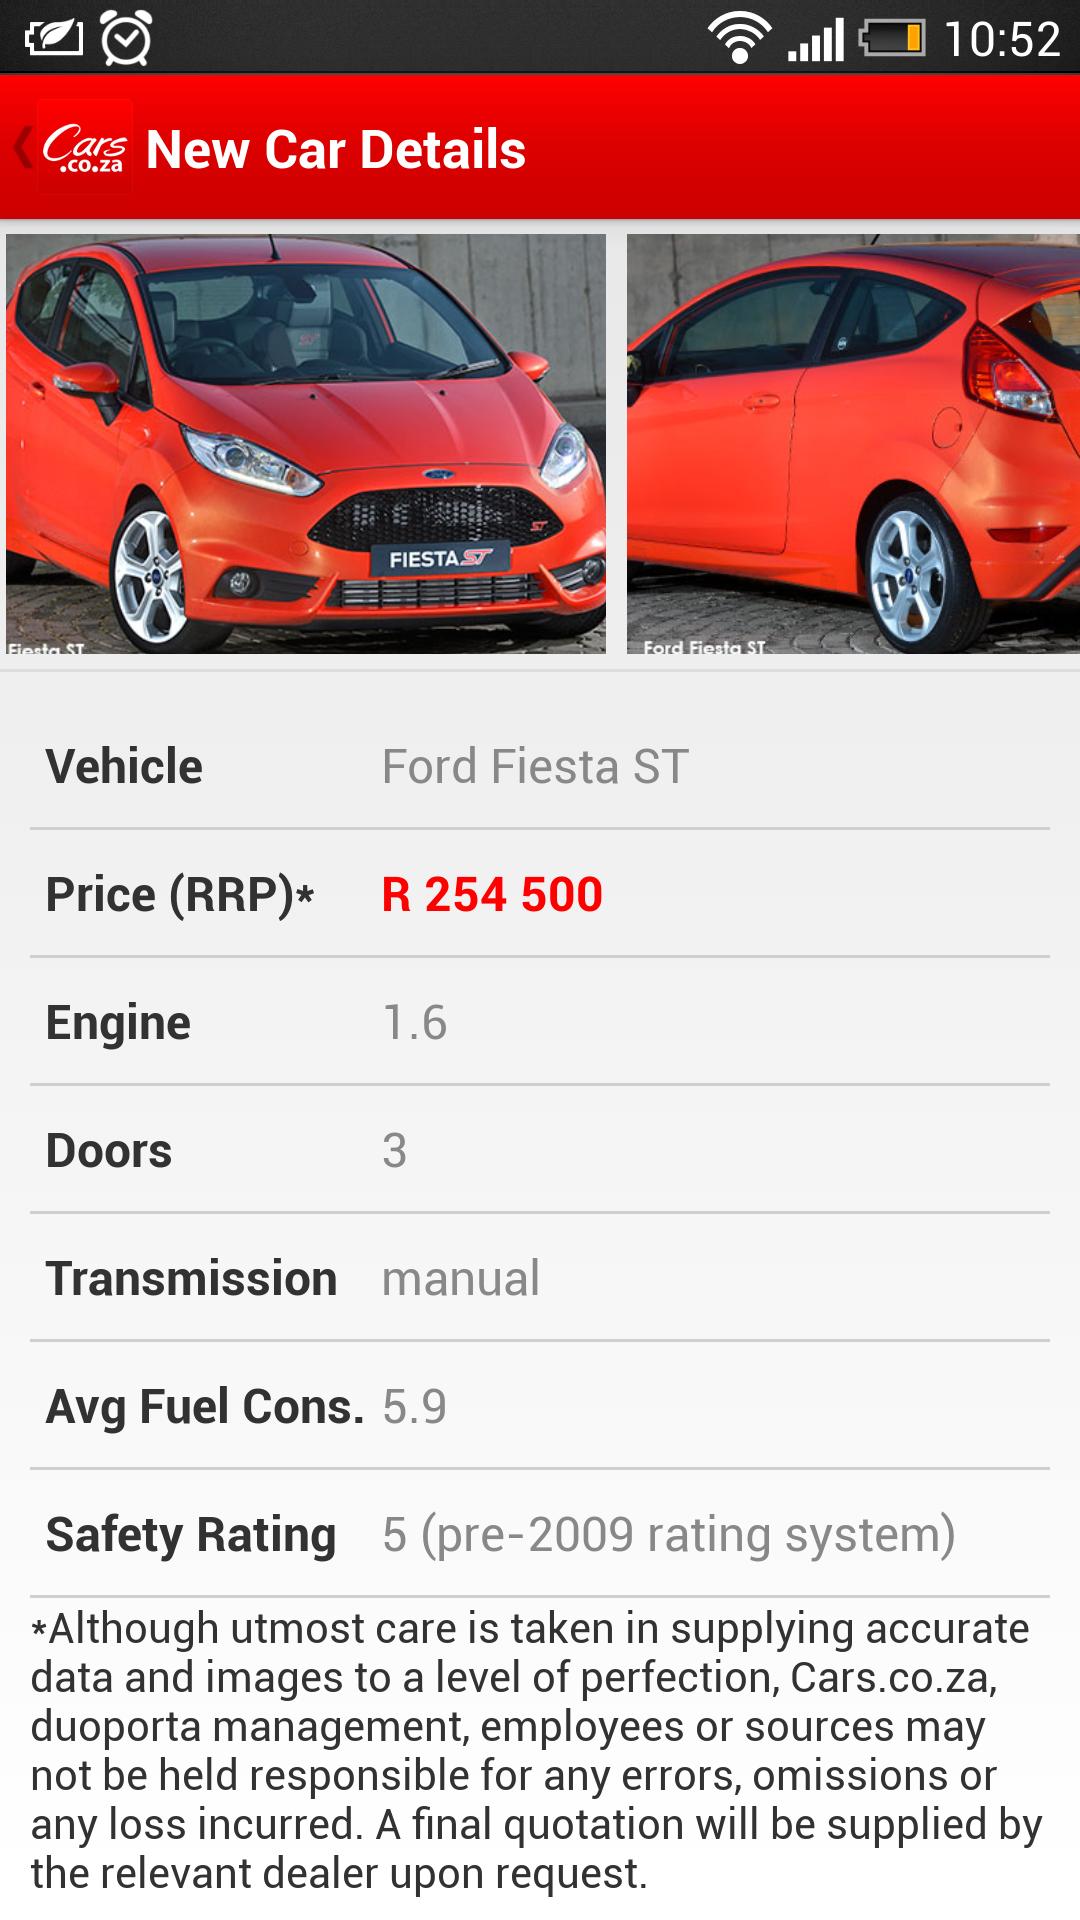 fiestast-car-price-south-africa  sc 1 st  Web AddiCT(s) & fiestast-car-price-south-africa » Web AddiCT(s); markmcfarlin.com